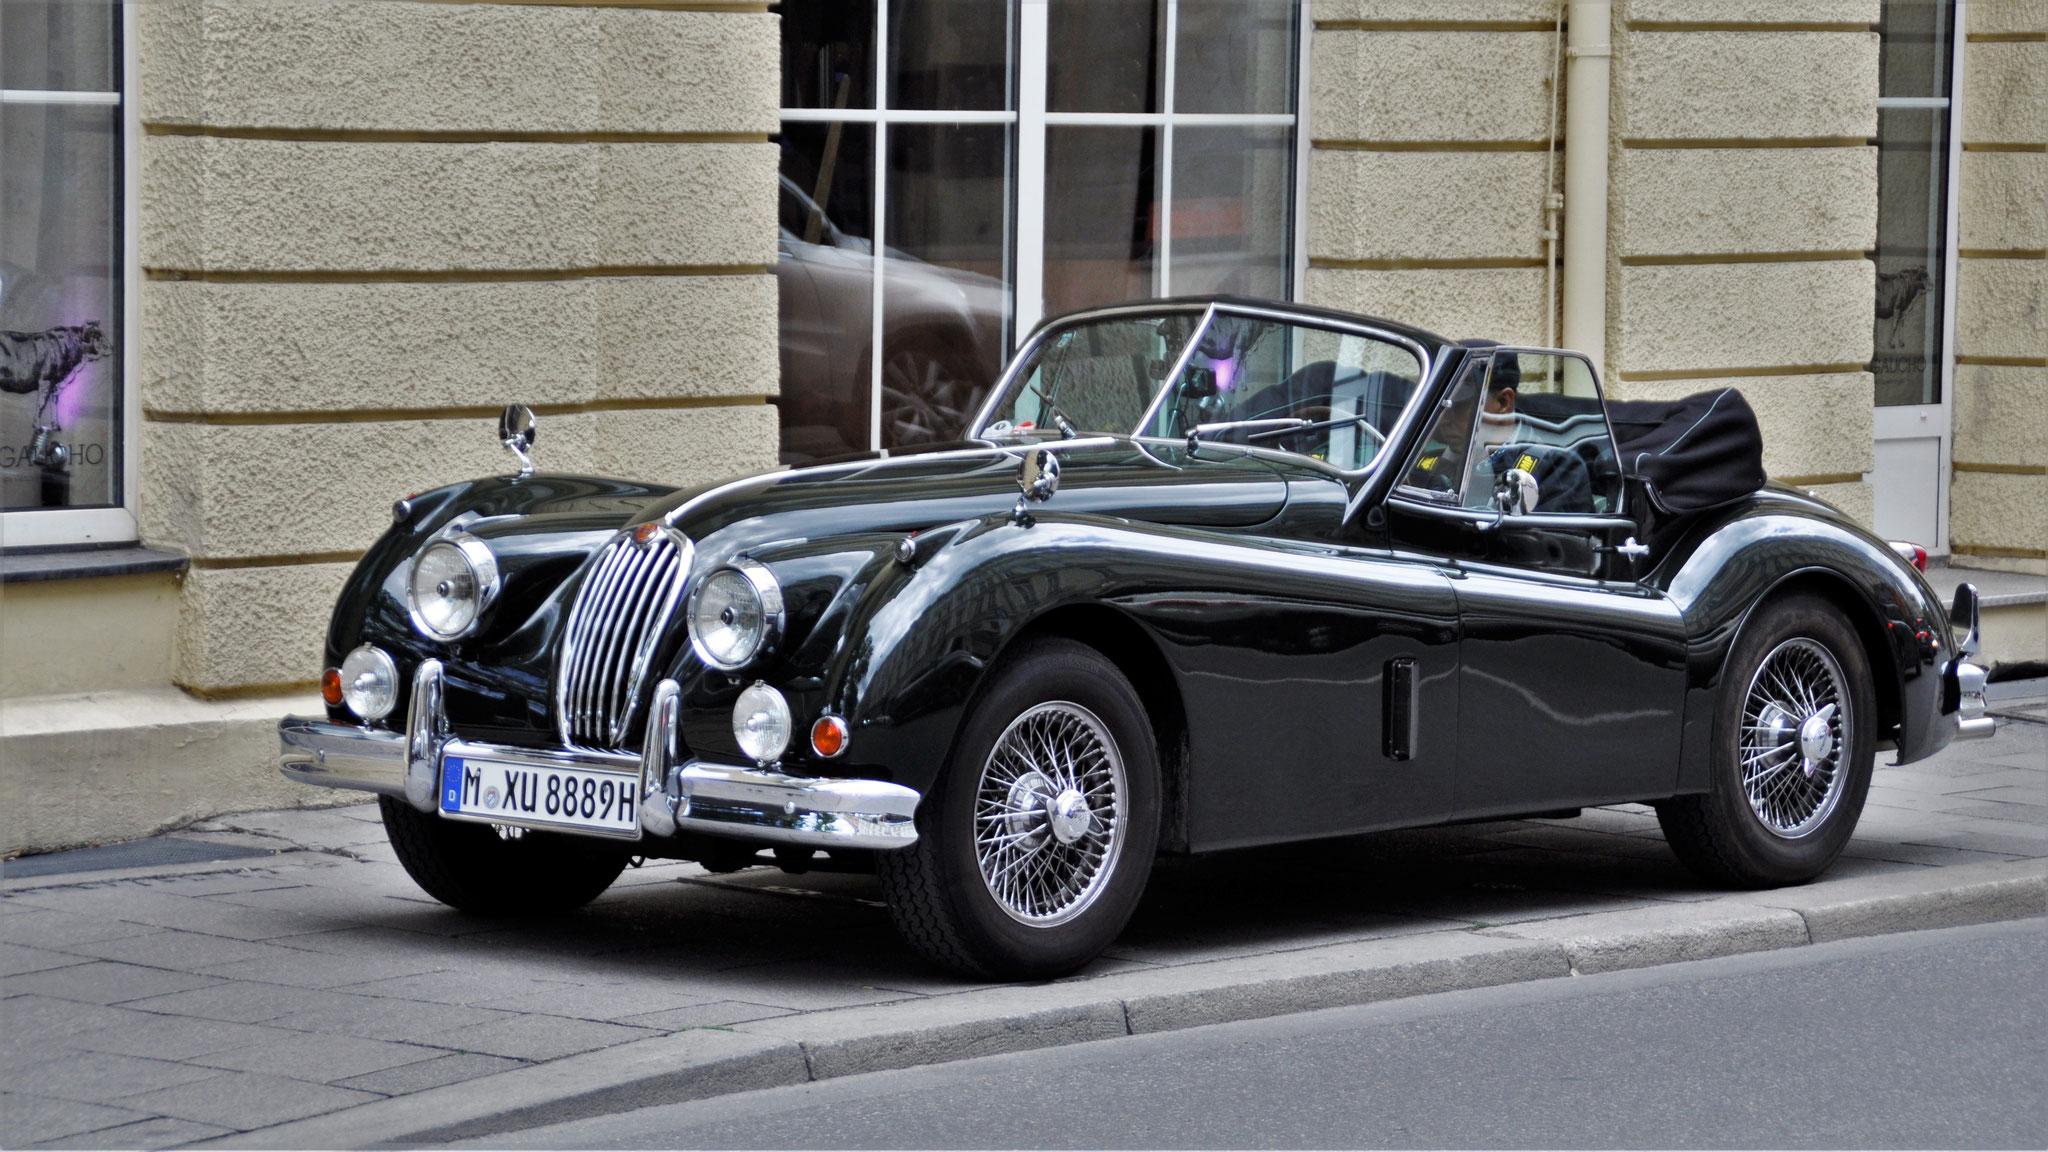 Jaguar XK 120 Cabrio - M-XU-8889H